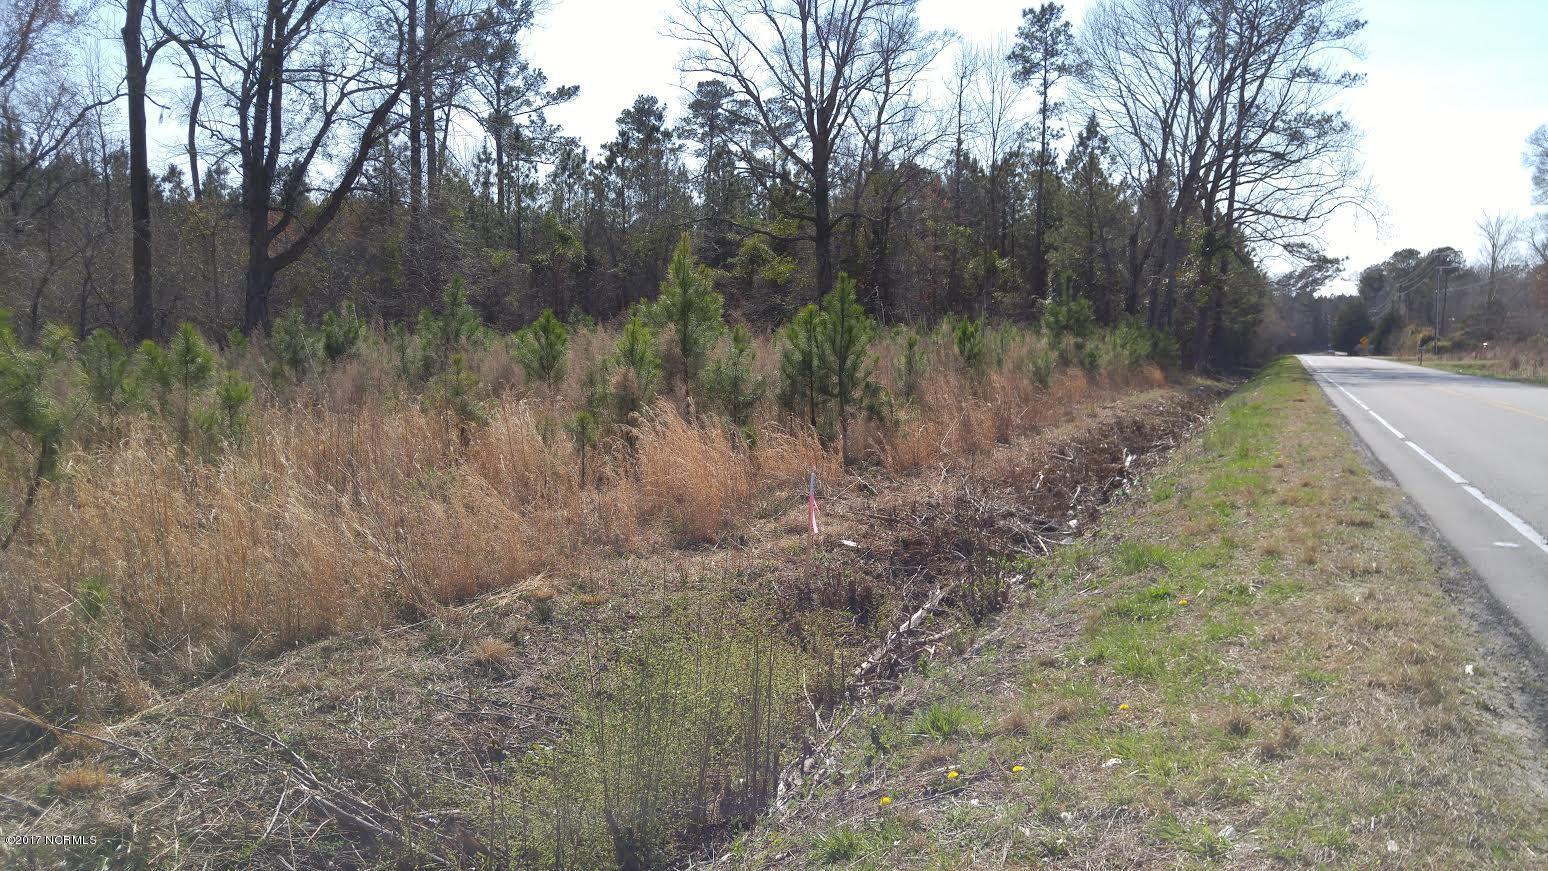 00 Rocky Run Road, Jacksonville, North Carolina 28546, ,Farm,For sale,Rocky Run,100170044